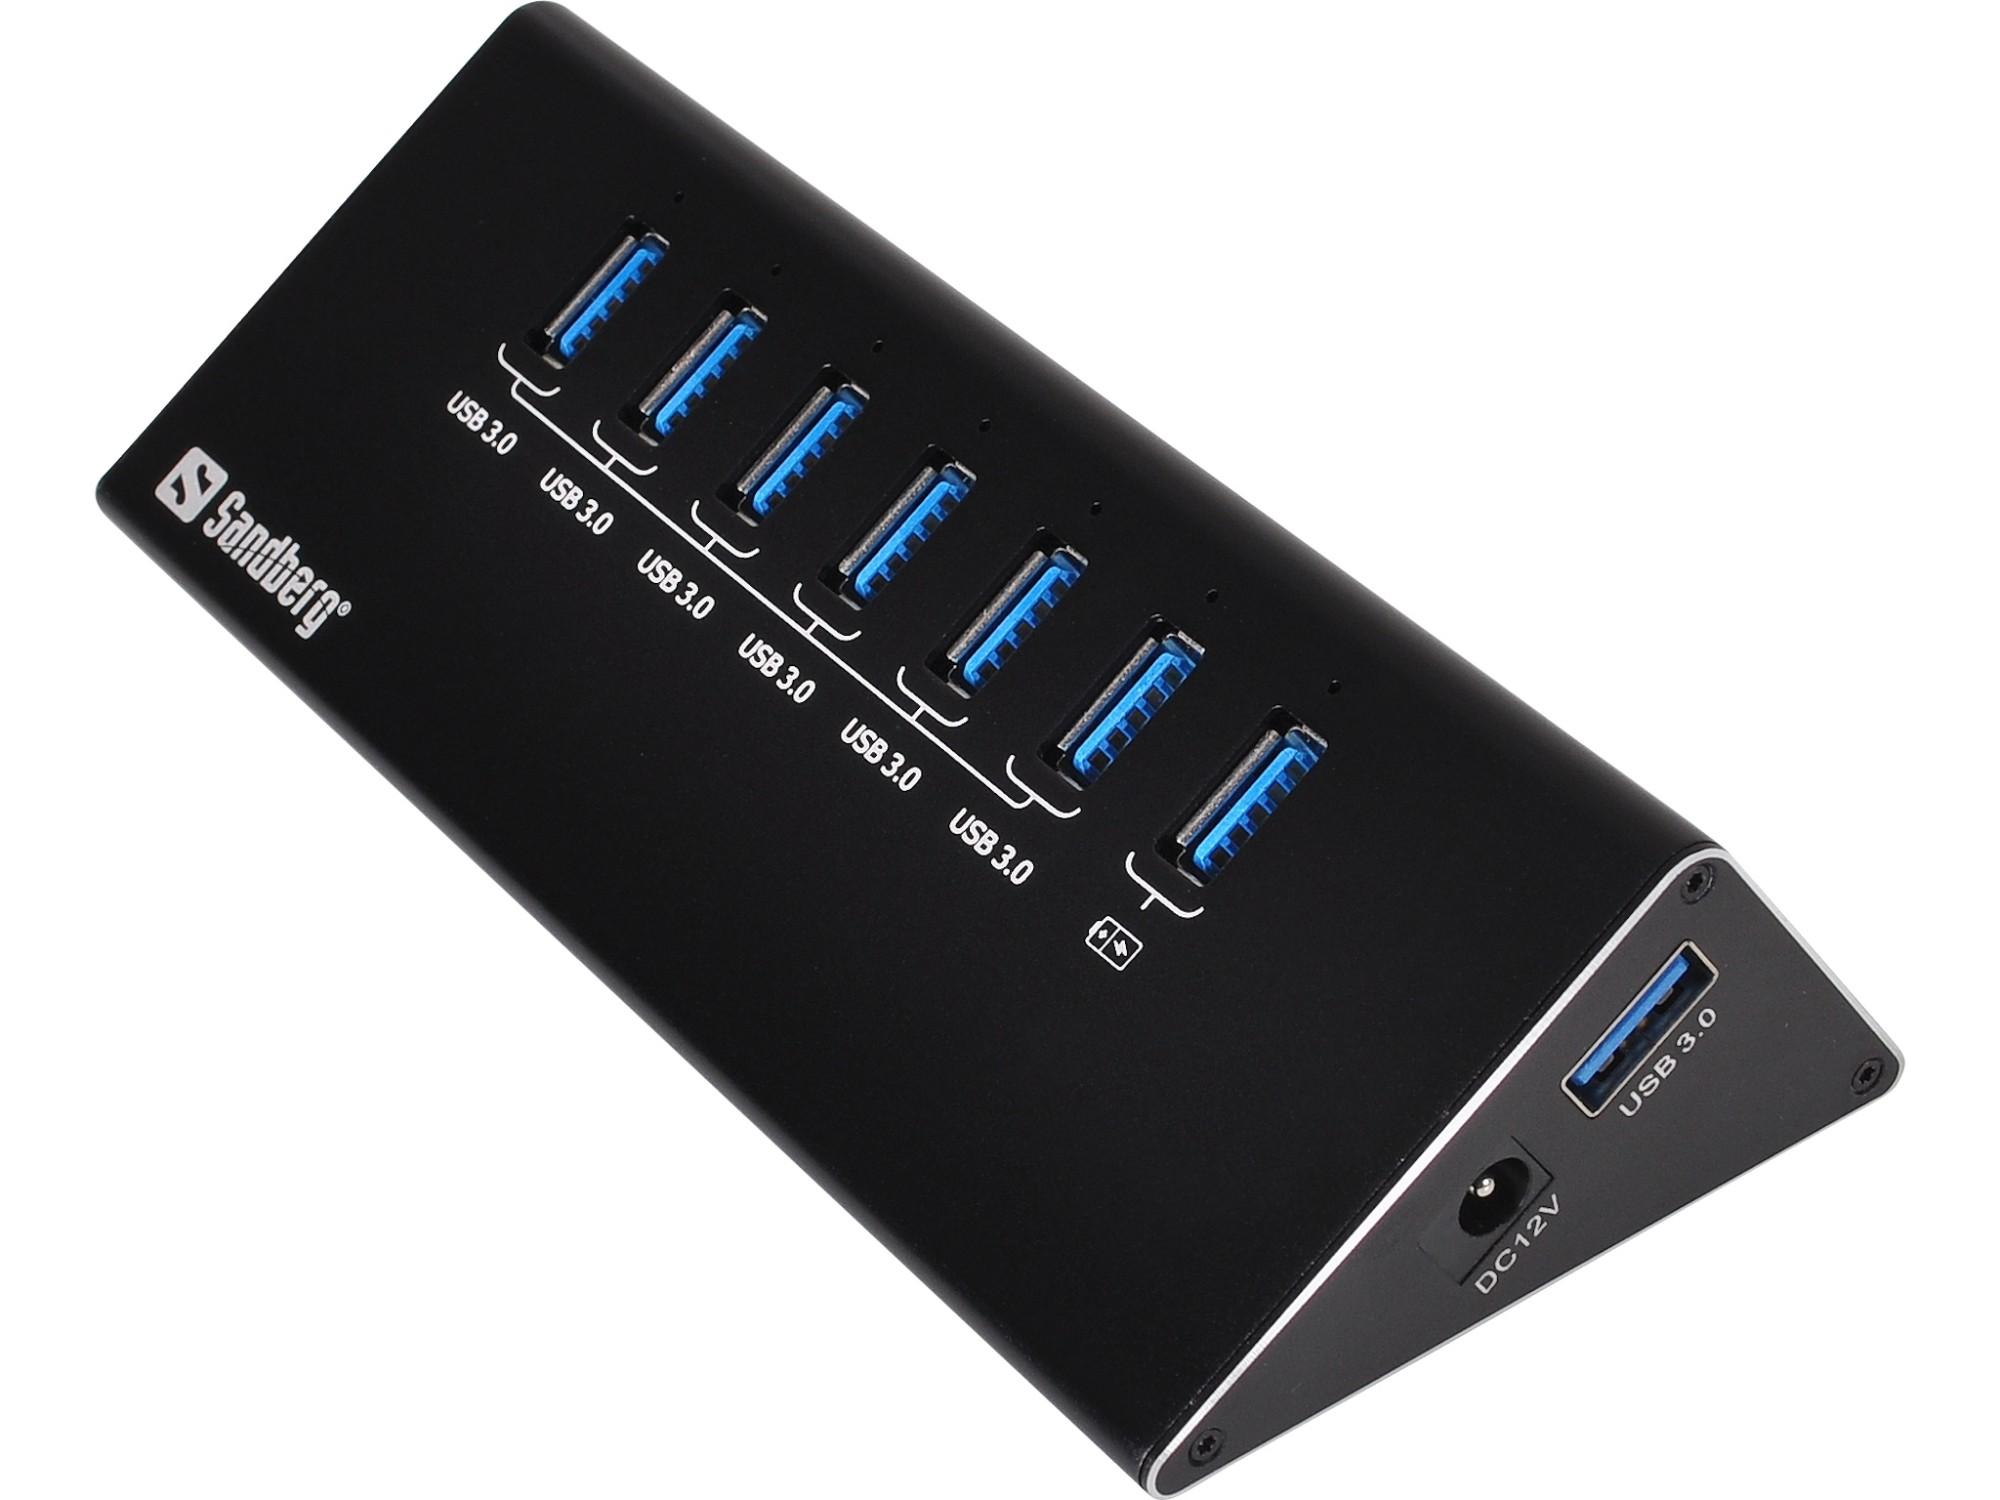 Sandberg USB 3.0 Hub 6+1 portsZZZZZ], 133-82